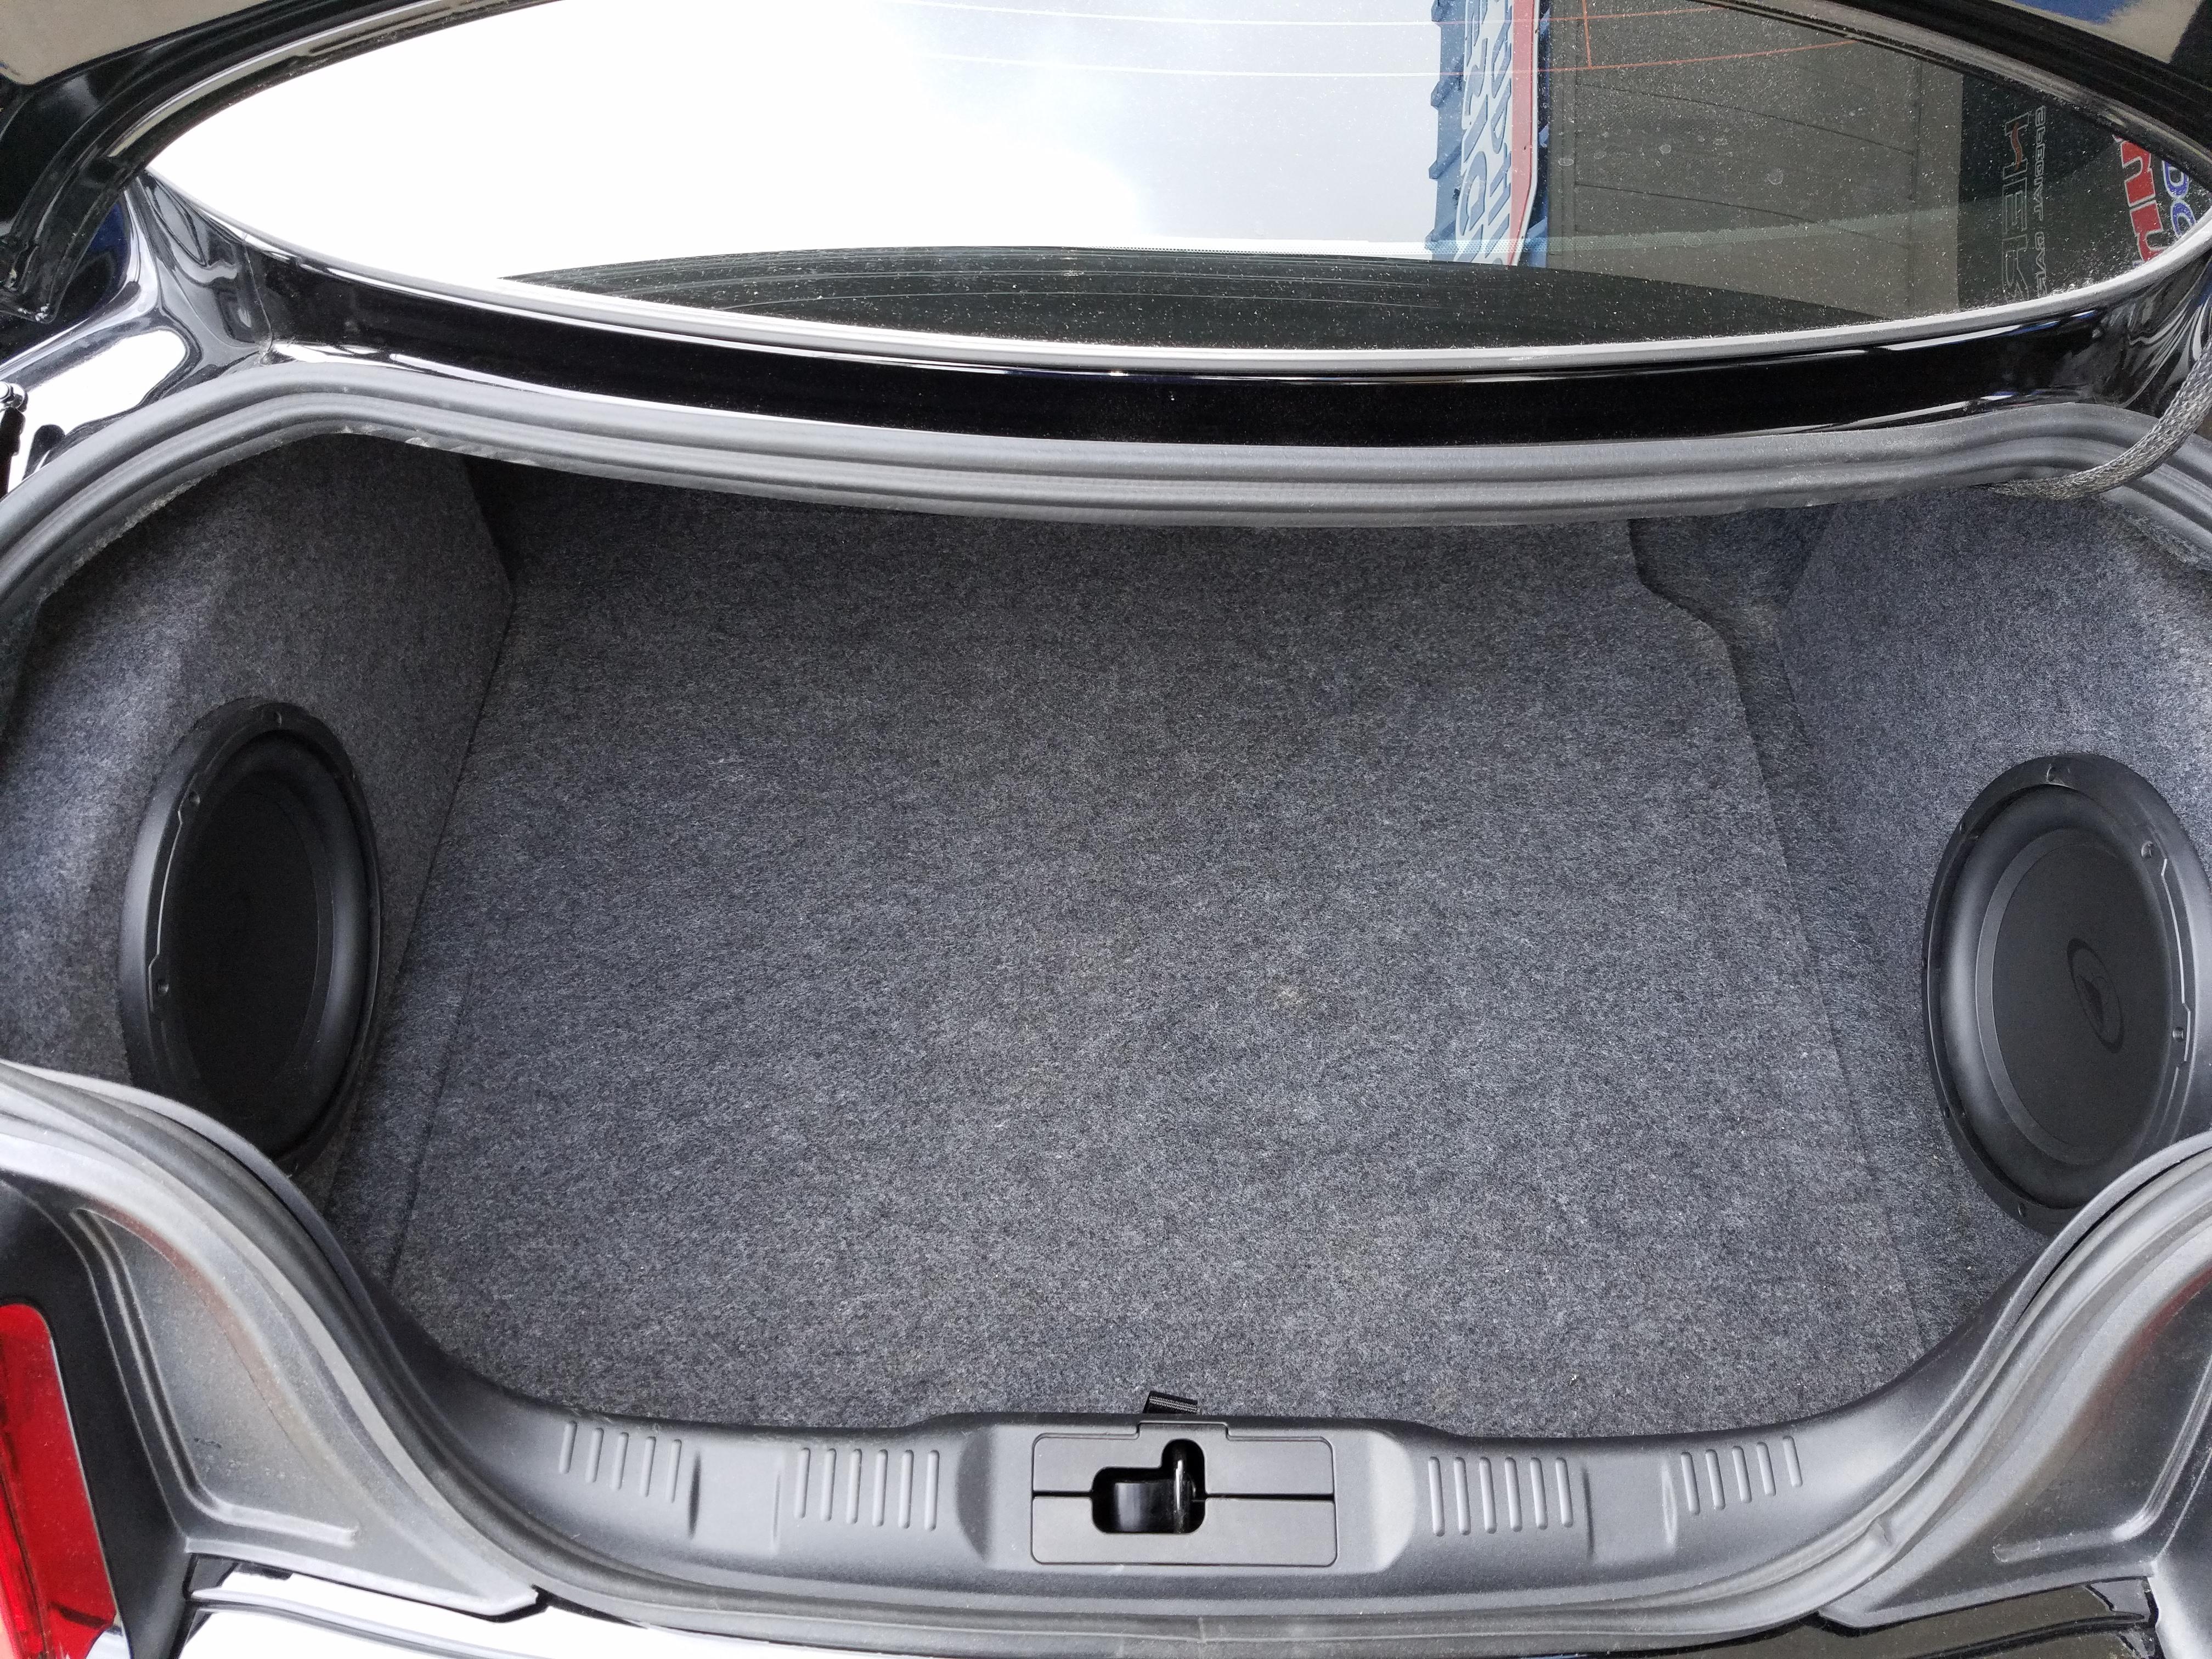 2015 2017 Ford Mustang Subwoofer Box Phantom Fit Enclosure